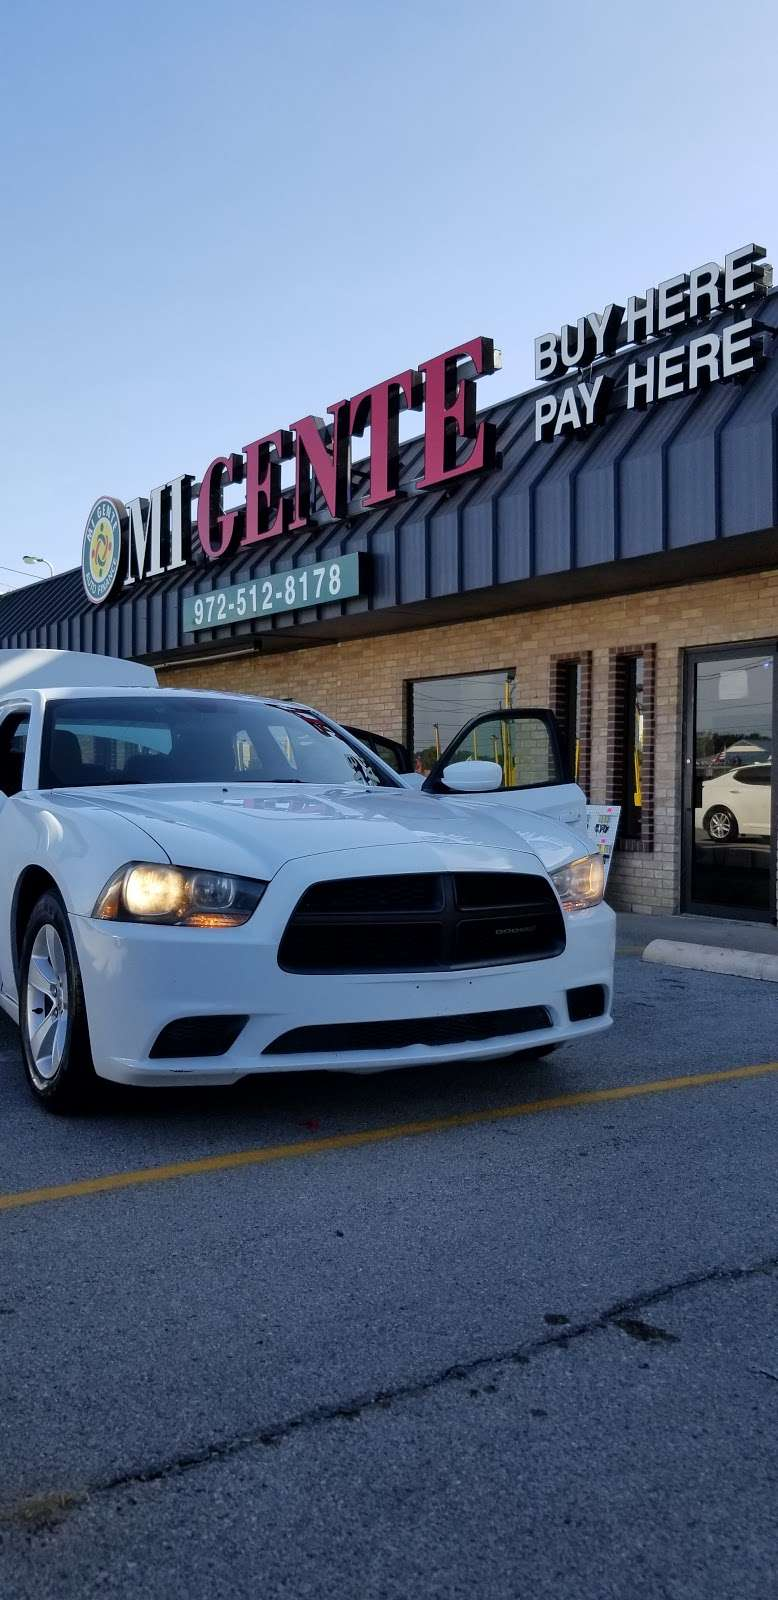 Mi Gente Dallas - car dealer  | Photo 1 of 10 | Address: 935 S Buckner Blvd, Dallas, TX 75217, USA | Phone: (972) 512-8178